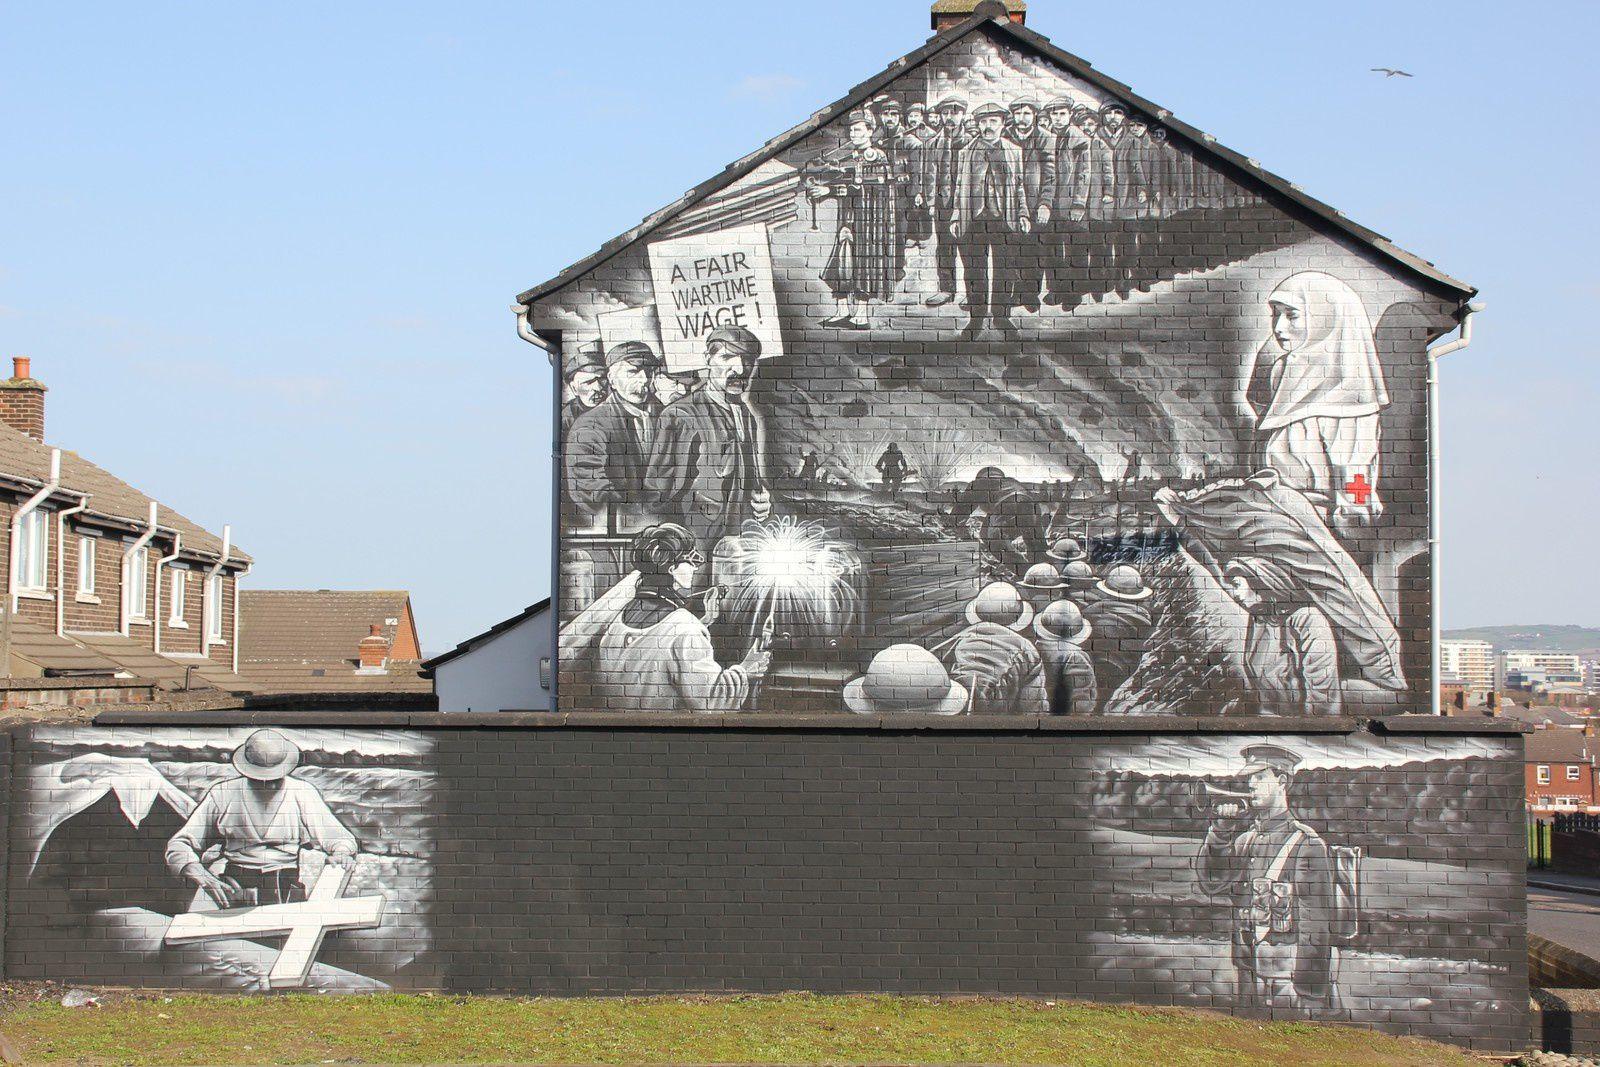 590) Hogarth Street, North Belfast